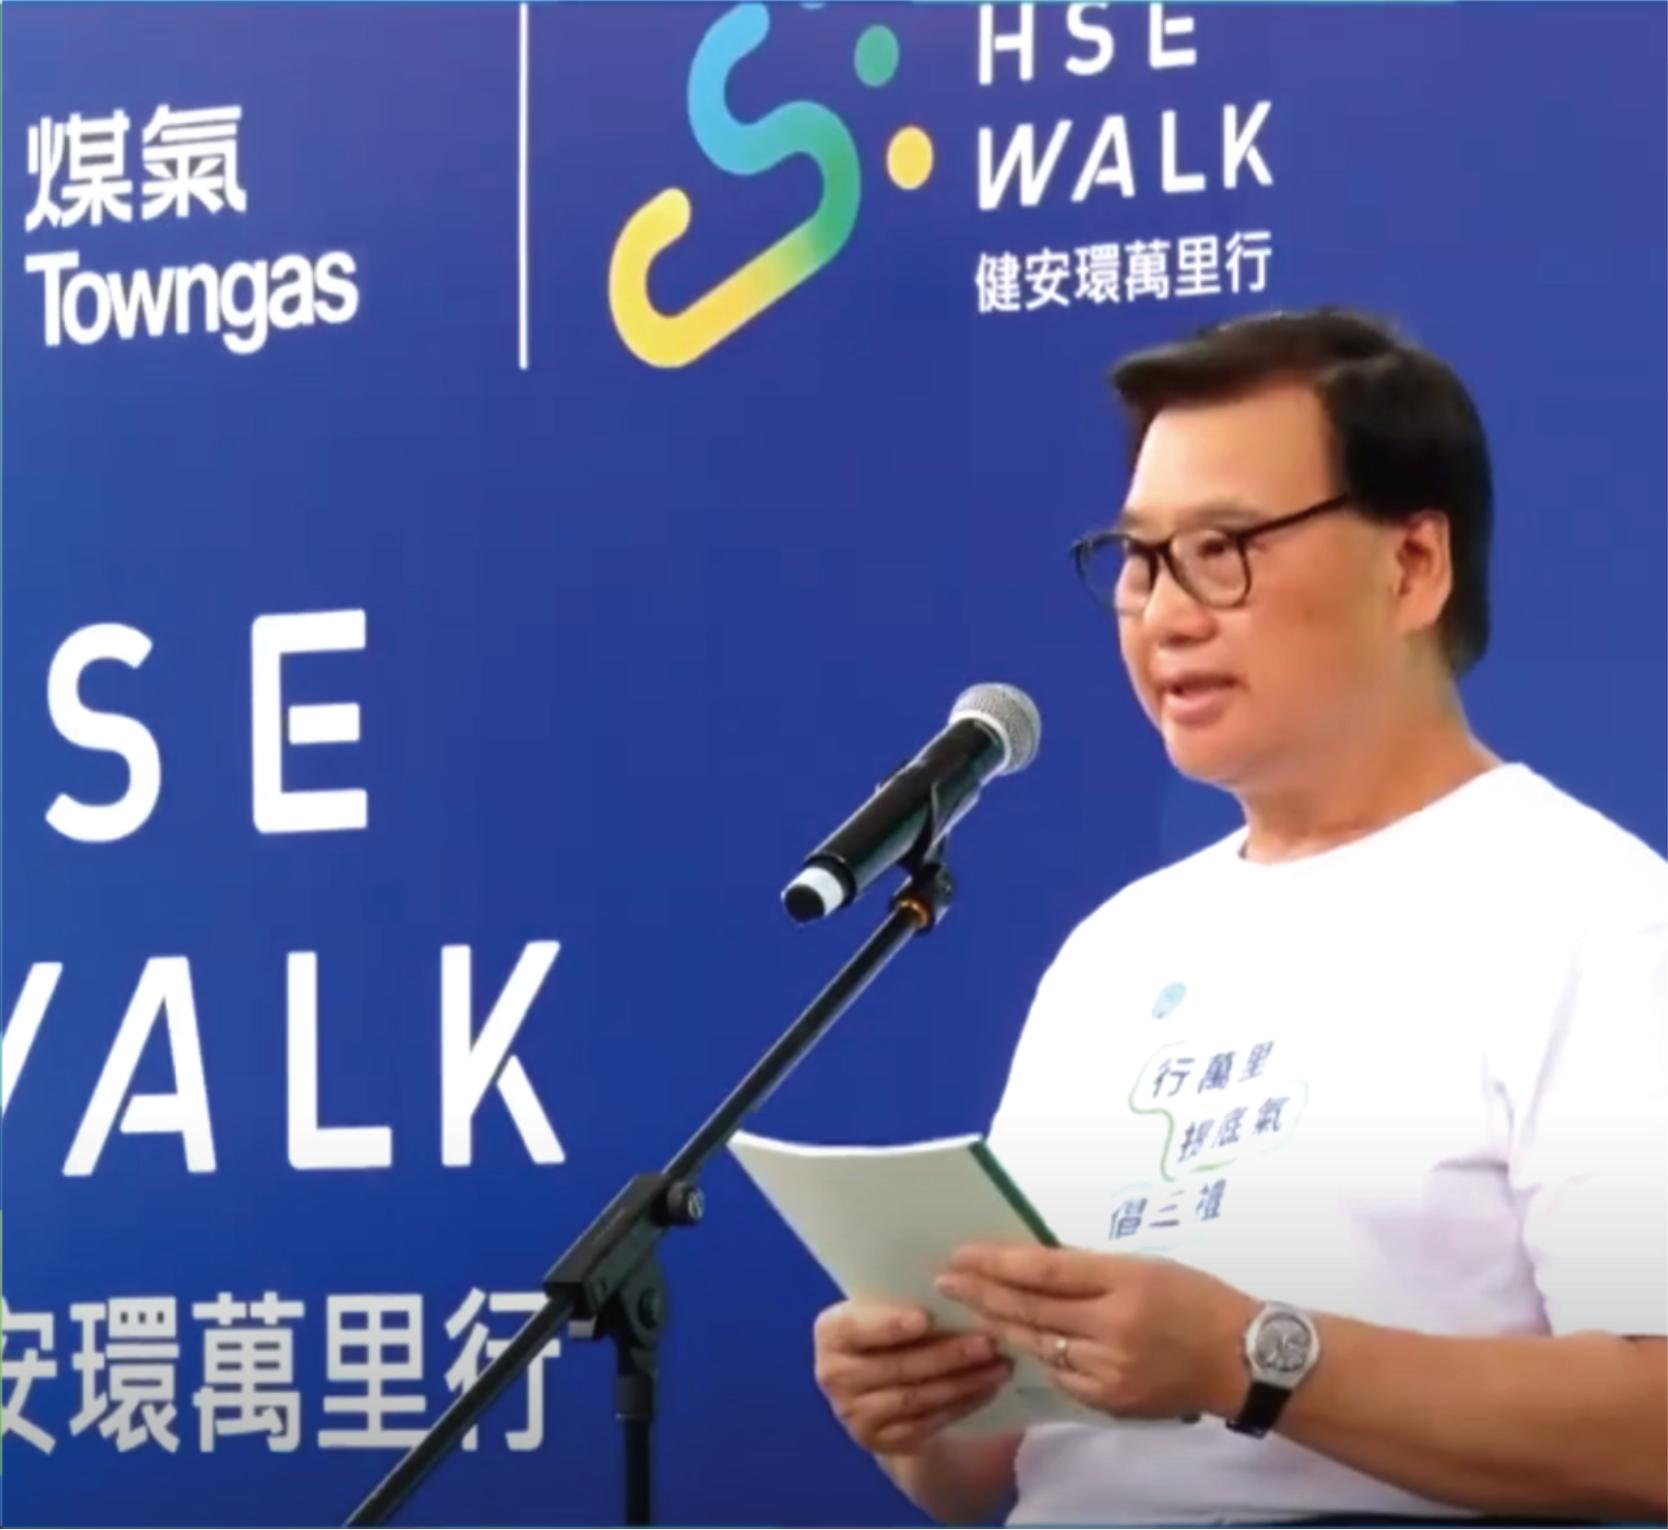 Towngas HSE Walk